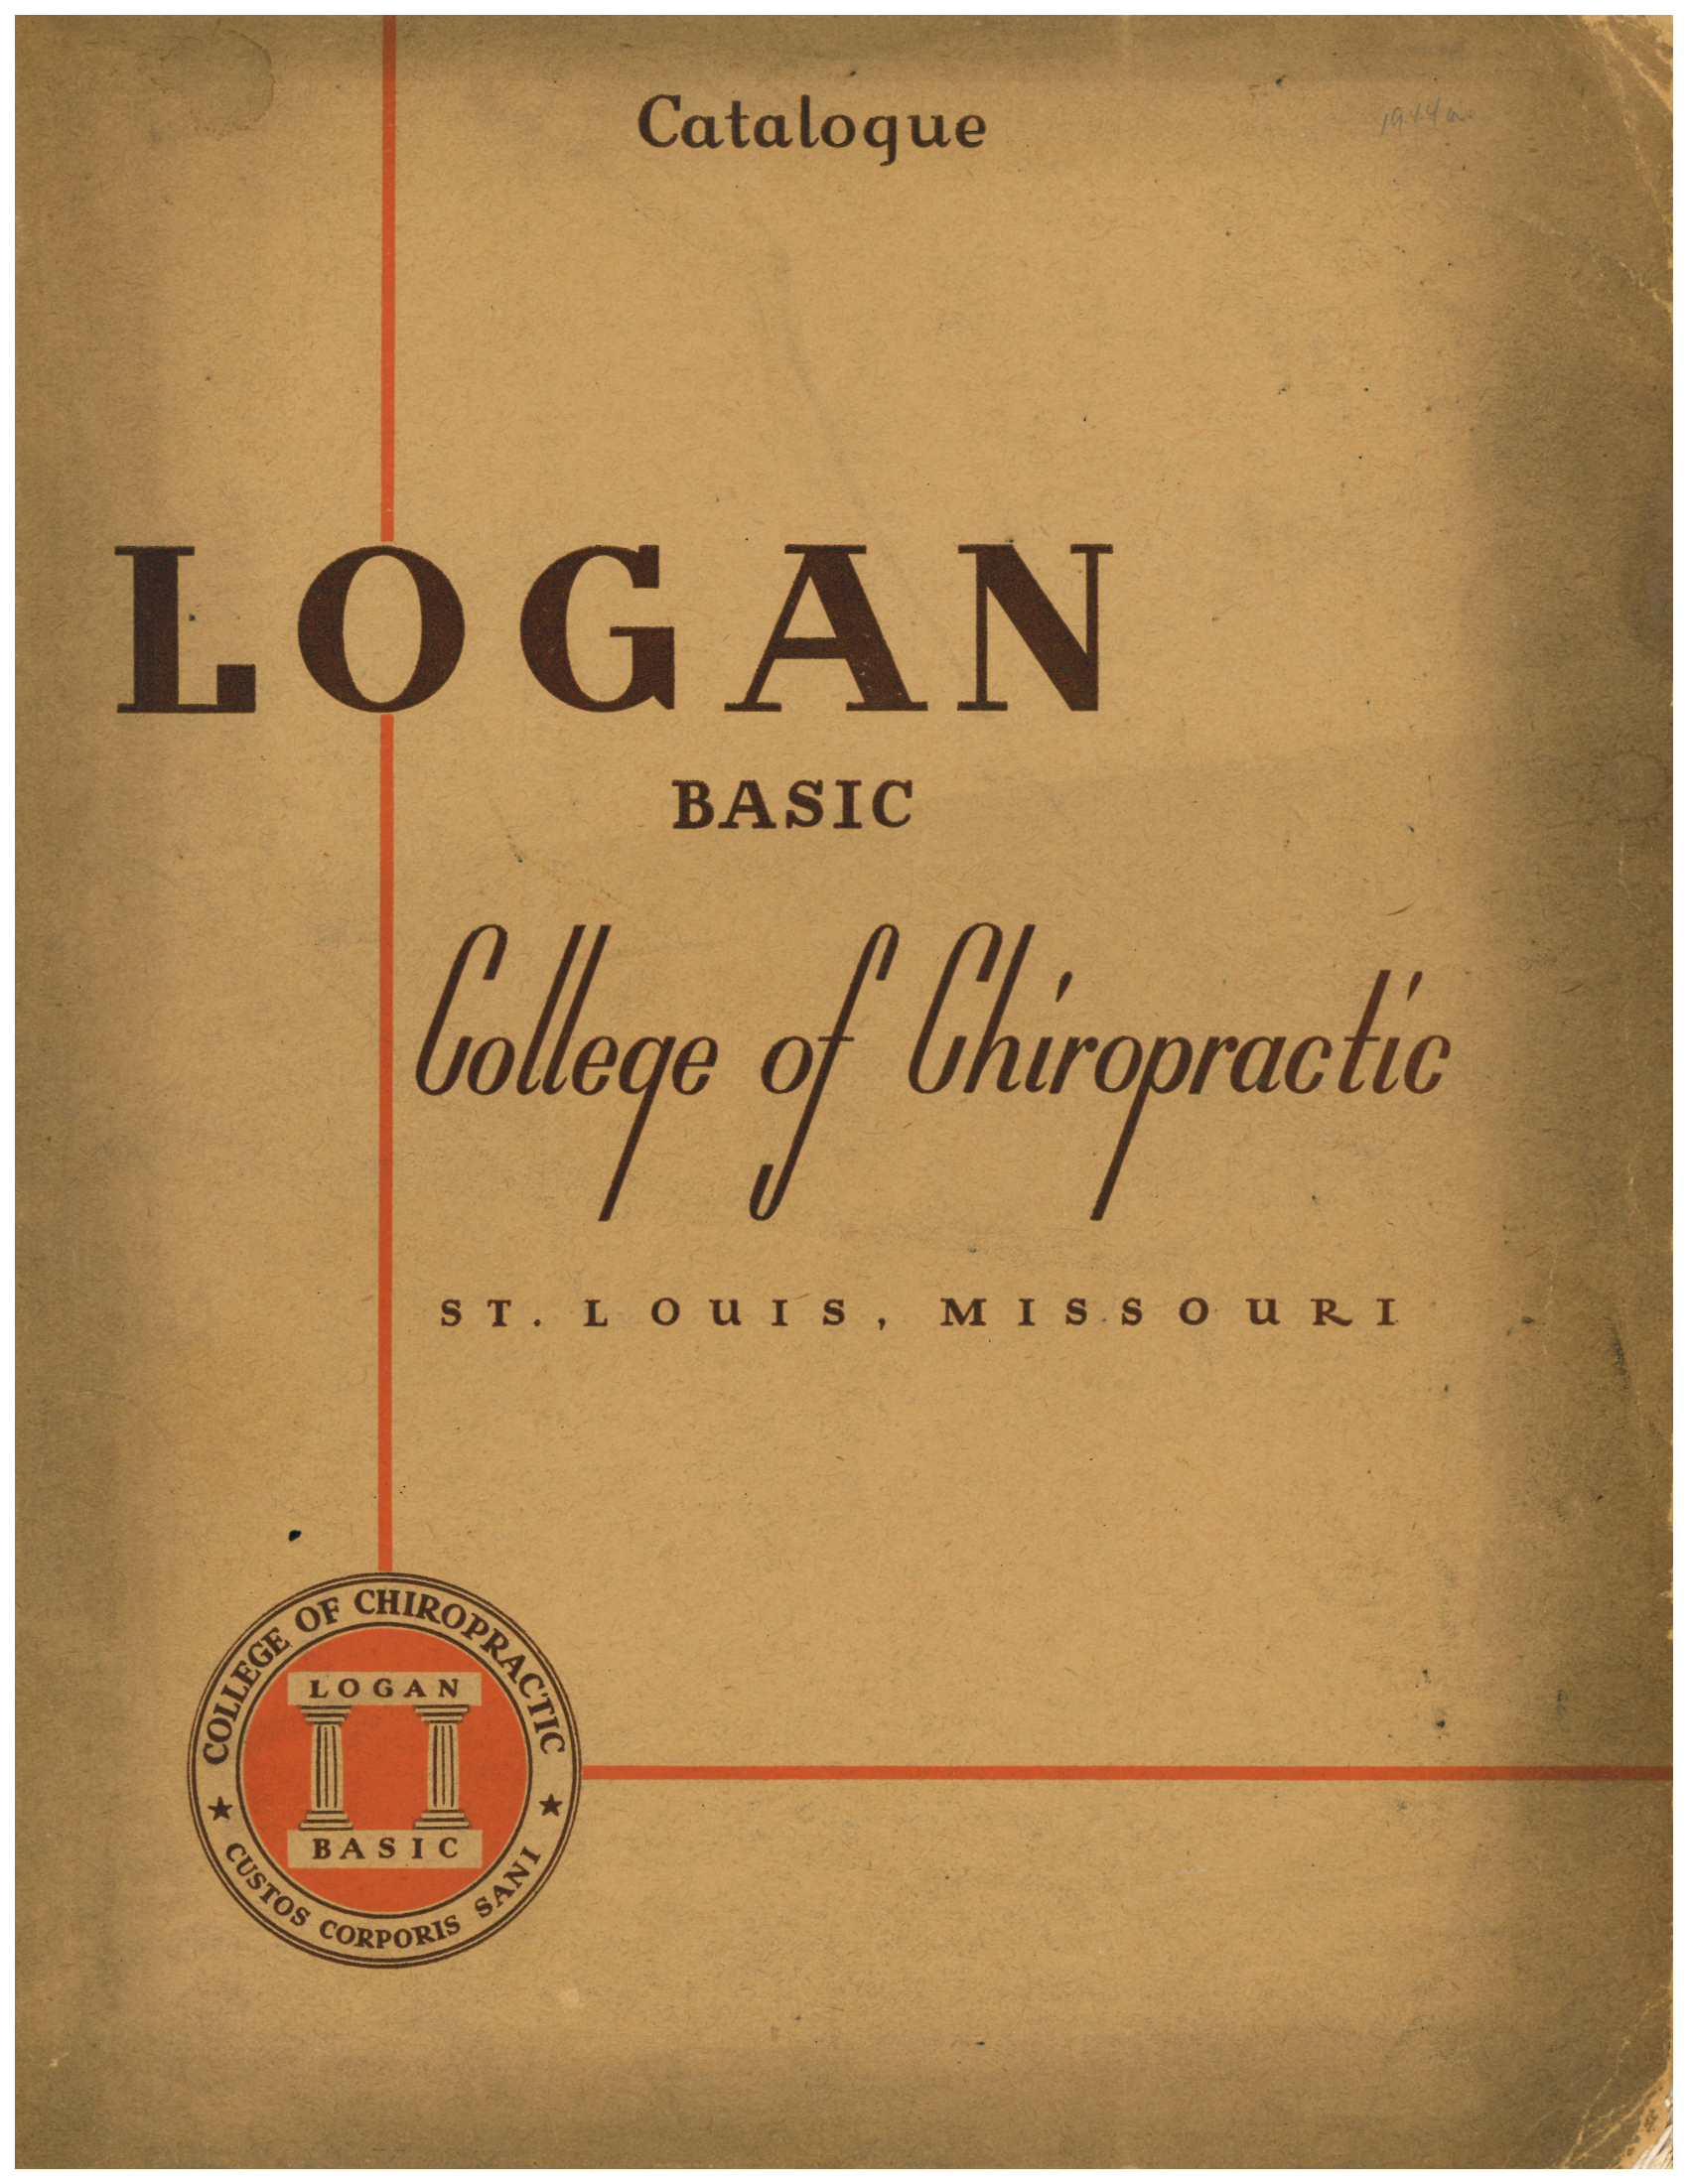 1944 Catalogue cover